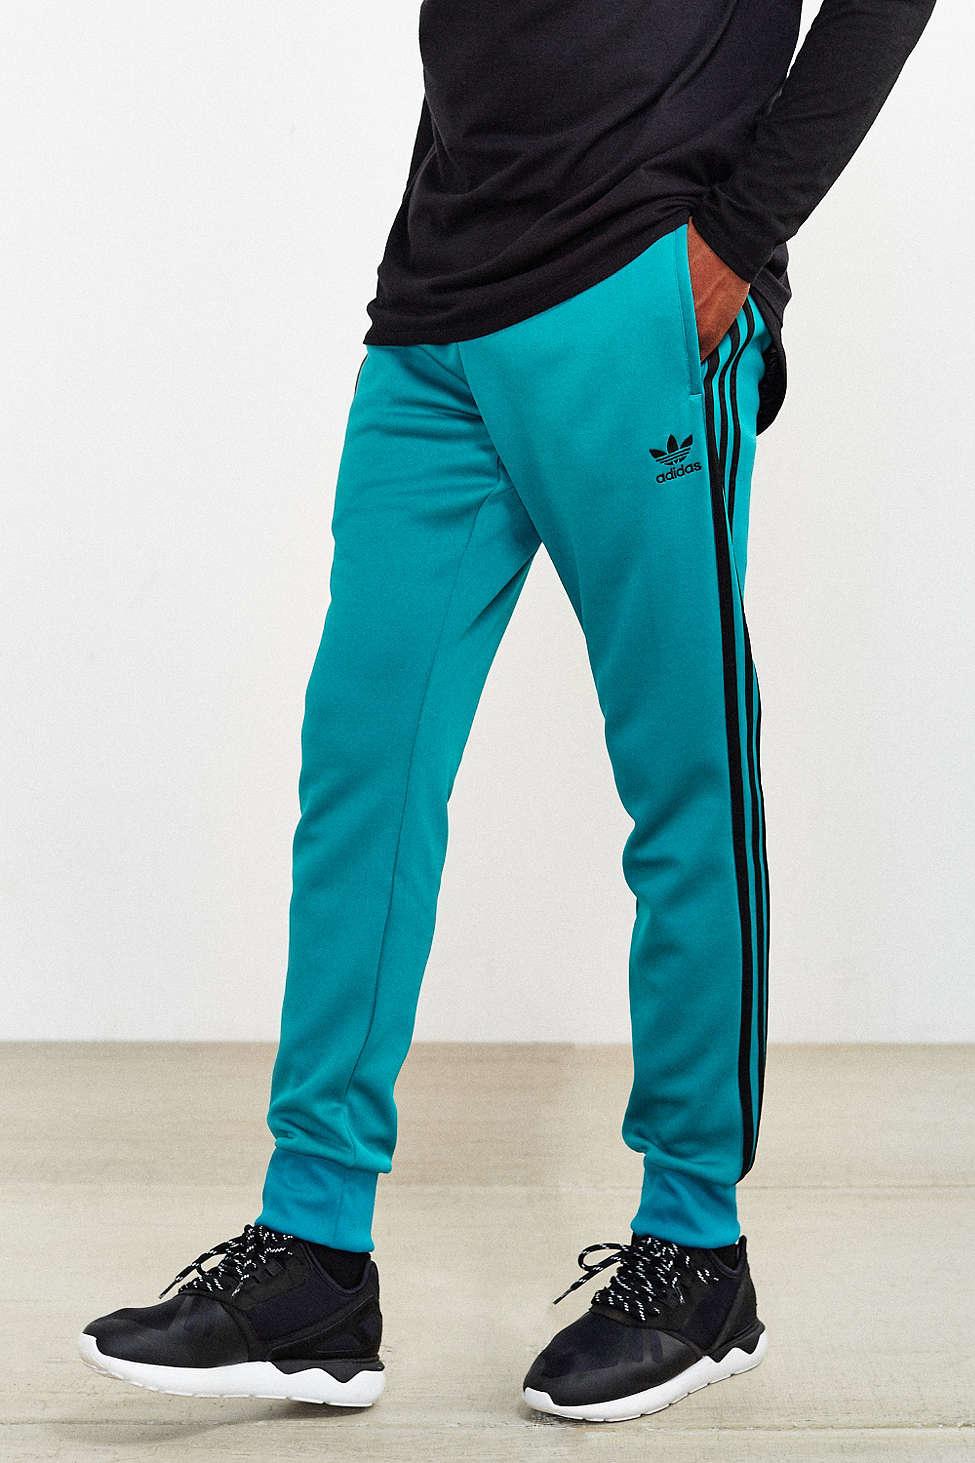 Lyst Adidas Originals Originals Superstar Cuff Track